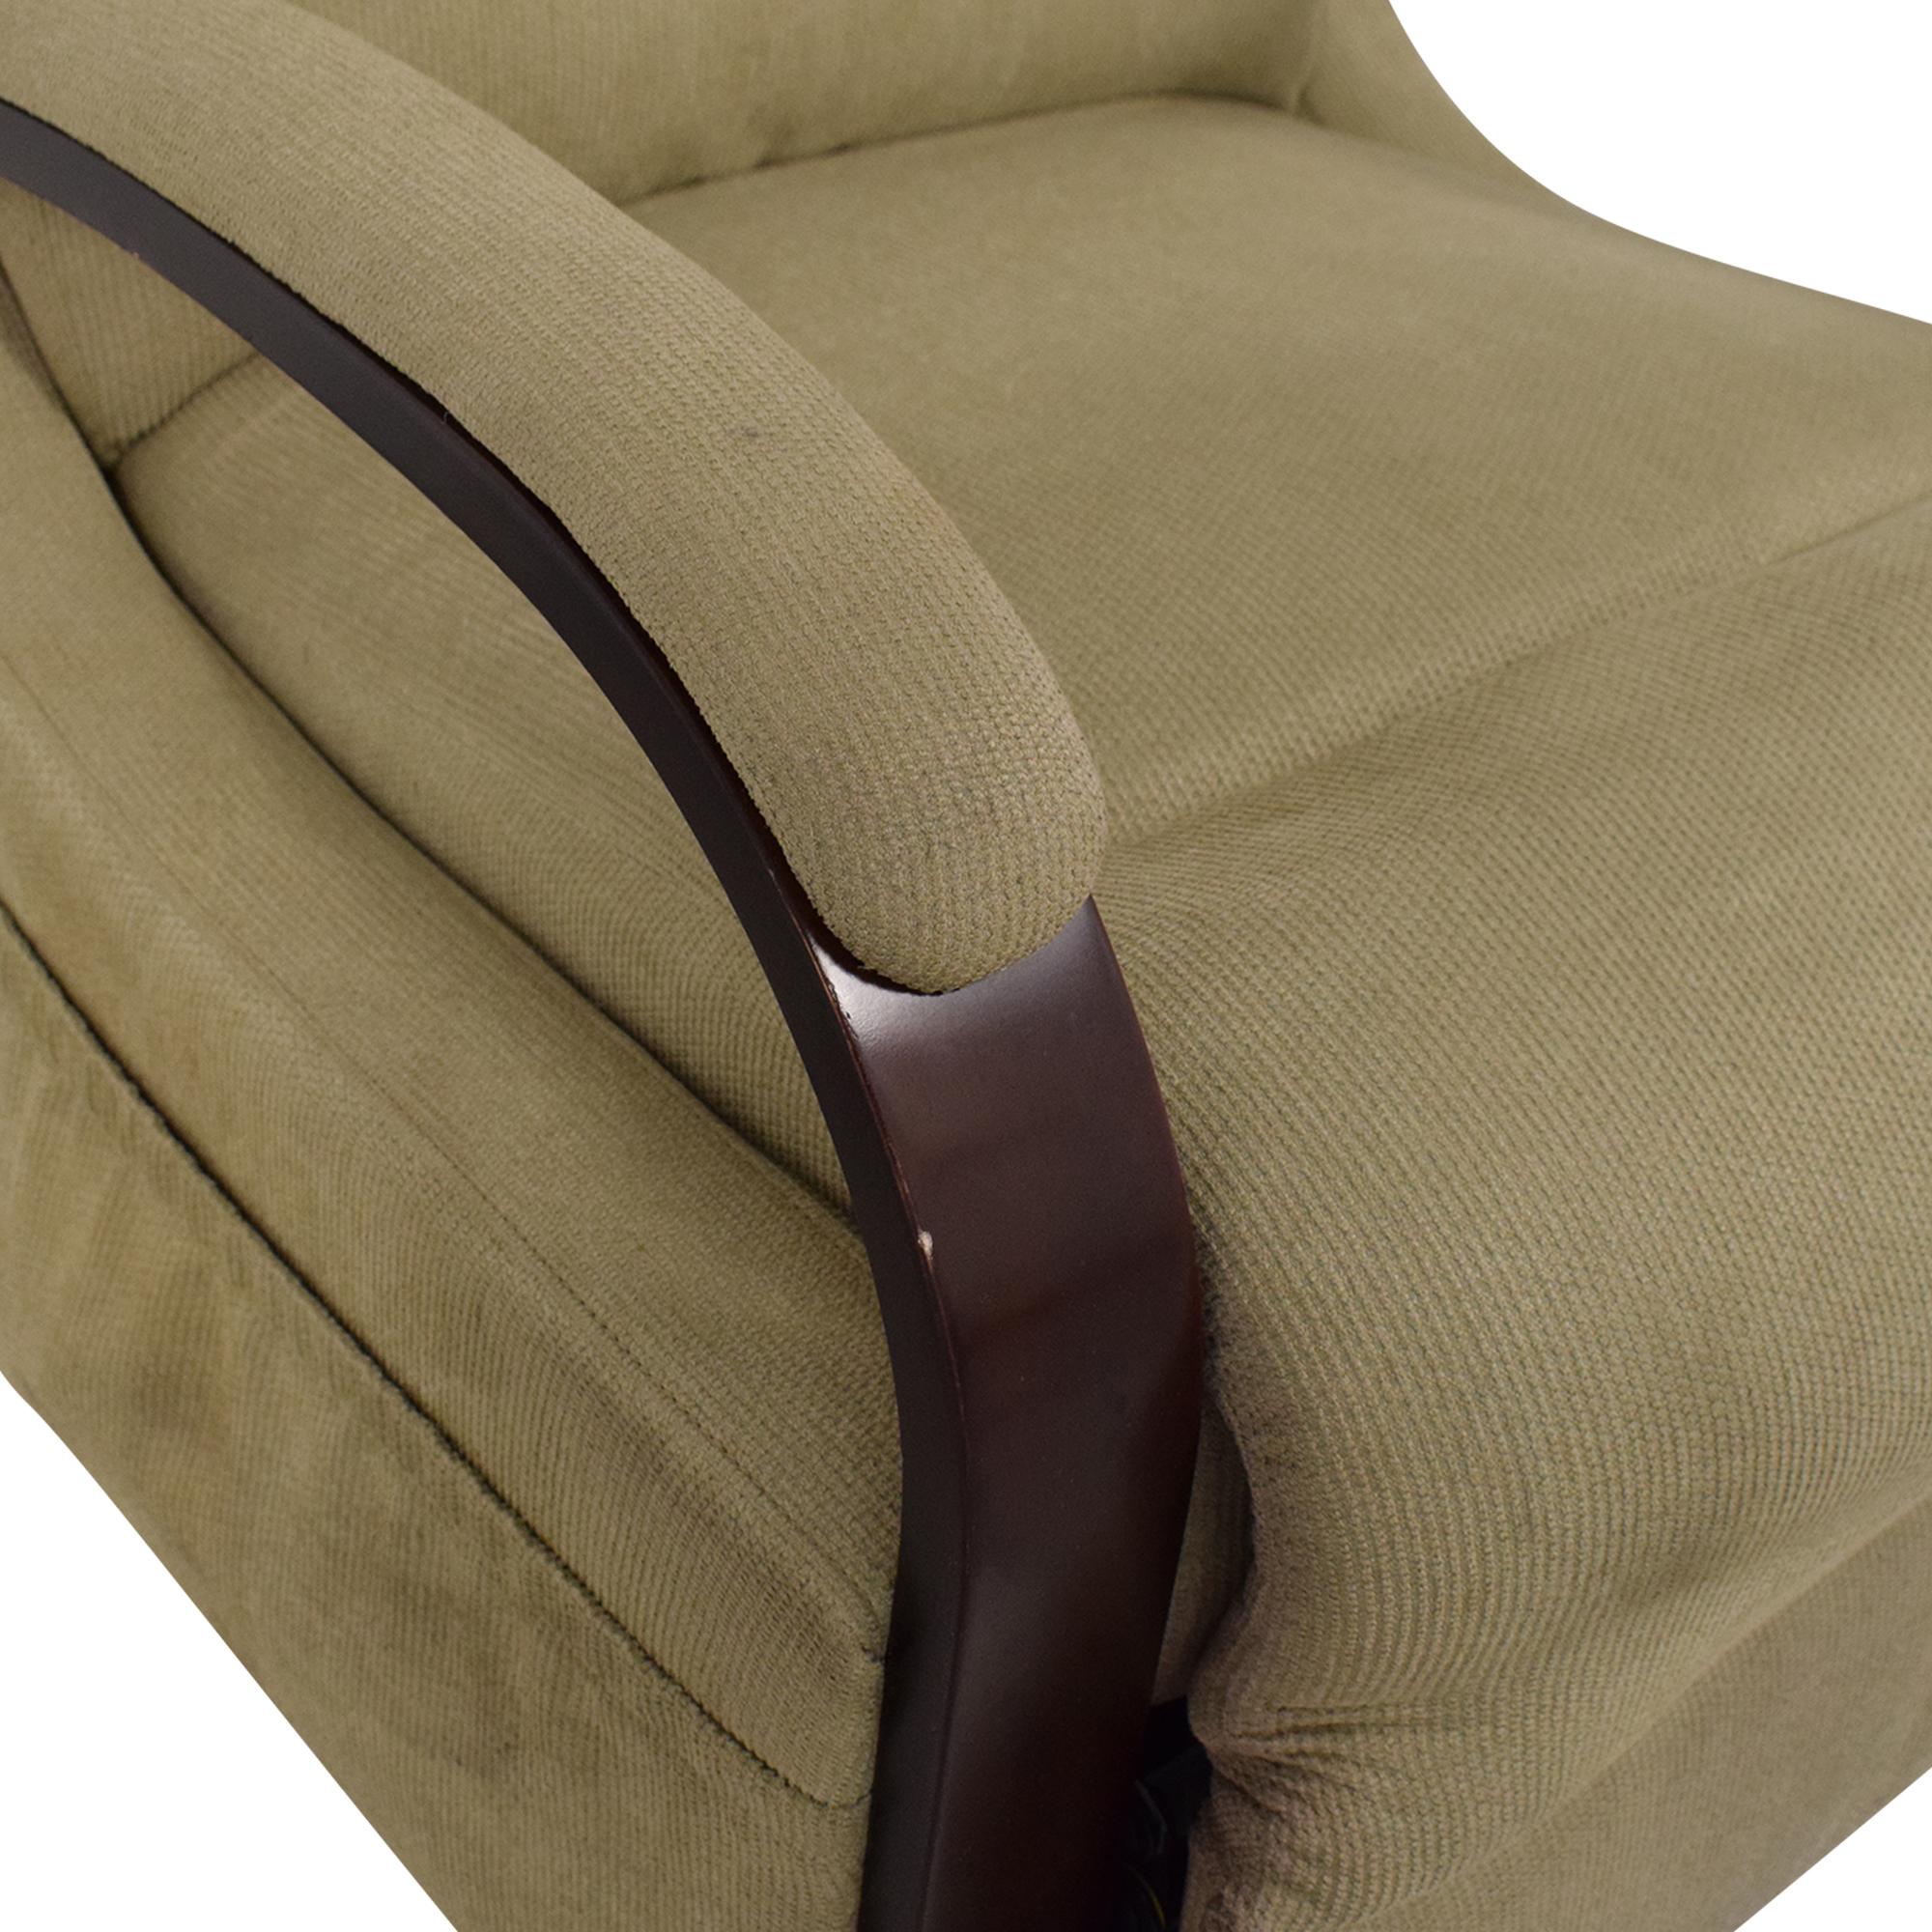 Macy's Macy's Power Lift Recliner Chair pa